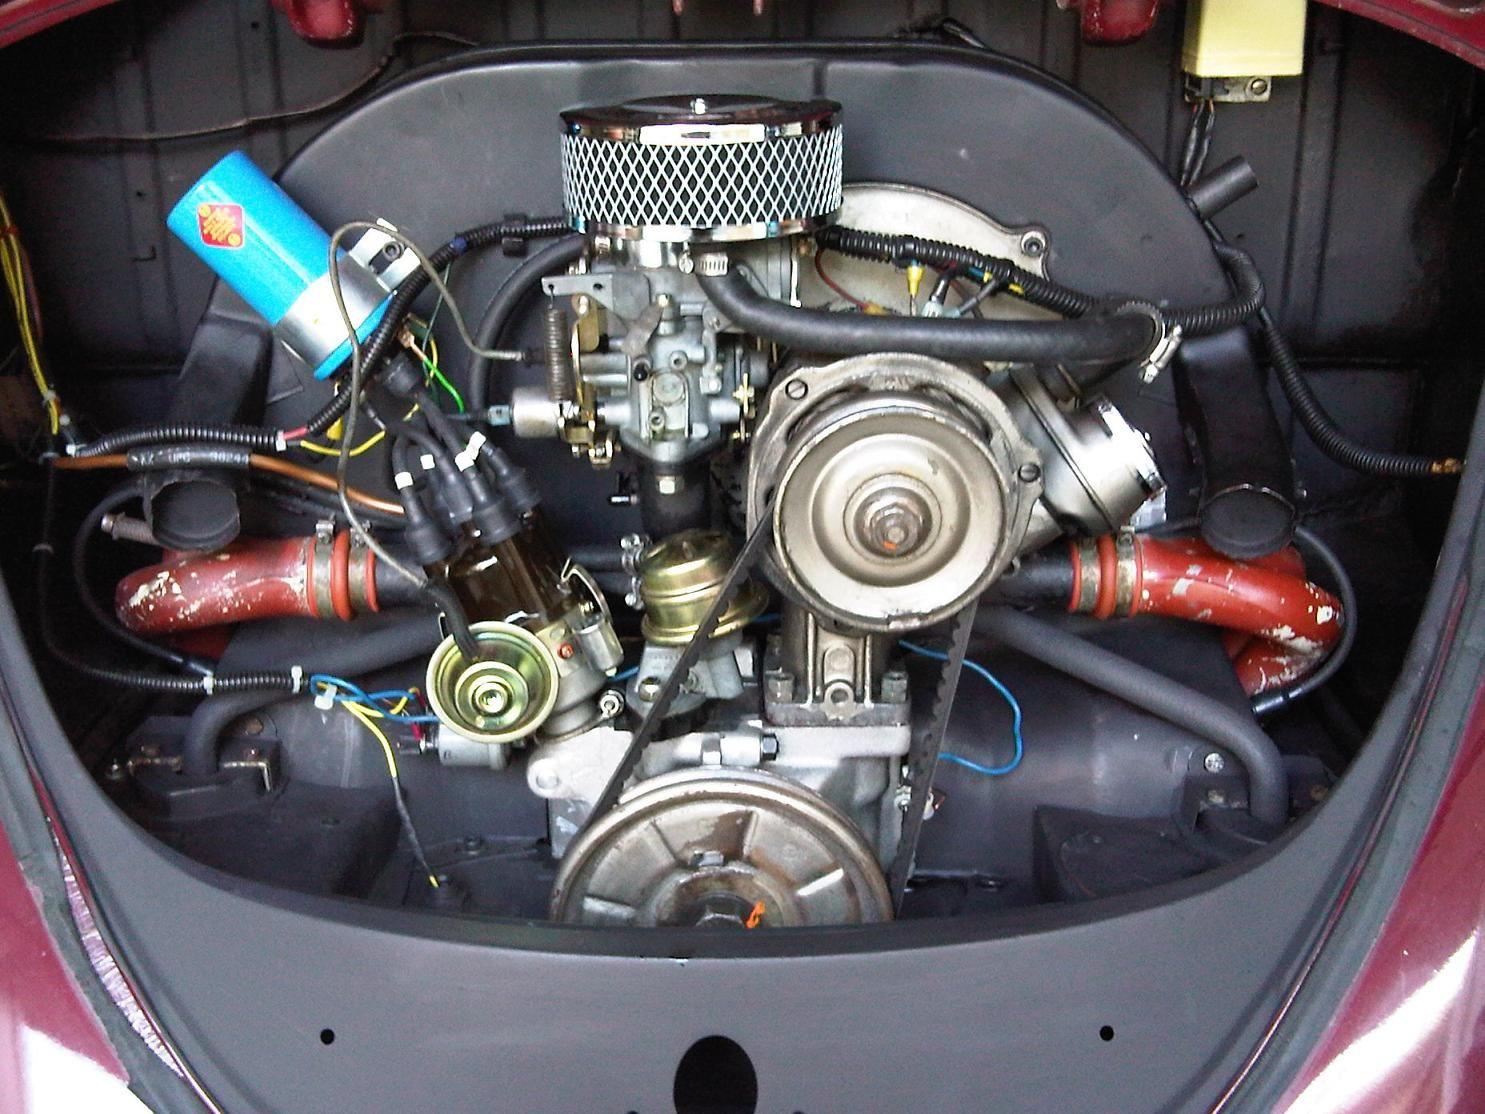 clean 1600cc engine in a standard bug the progressive dual weber carburetor is a nice [ 1485 x 1114 Pixel ]